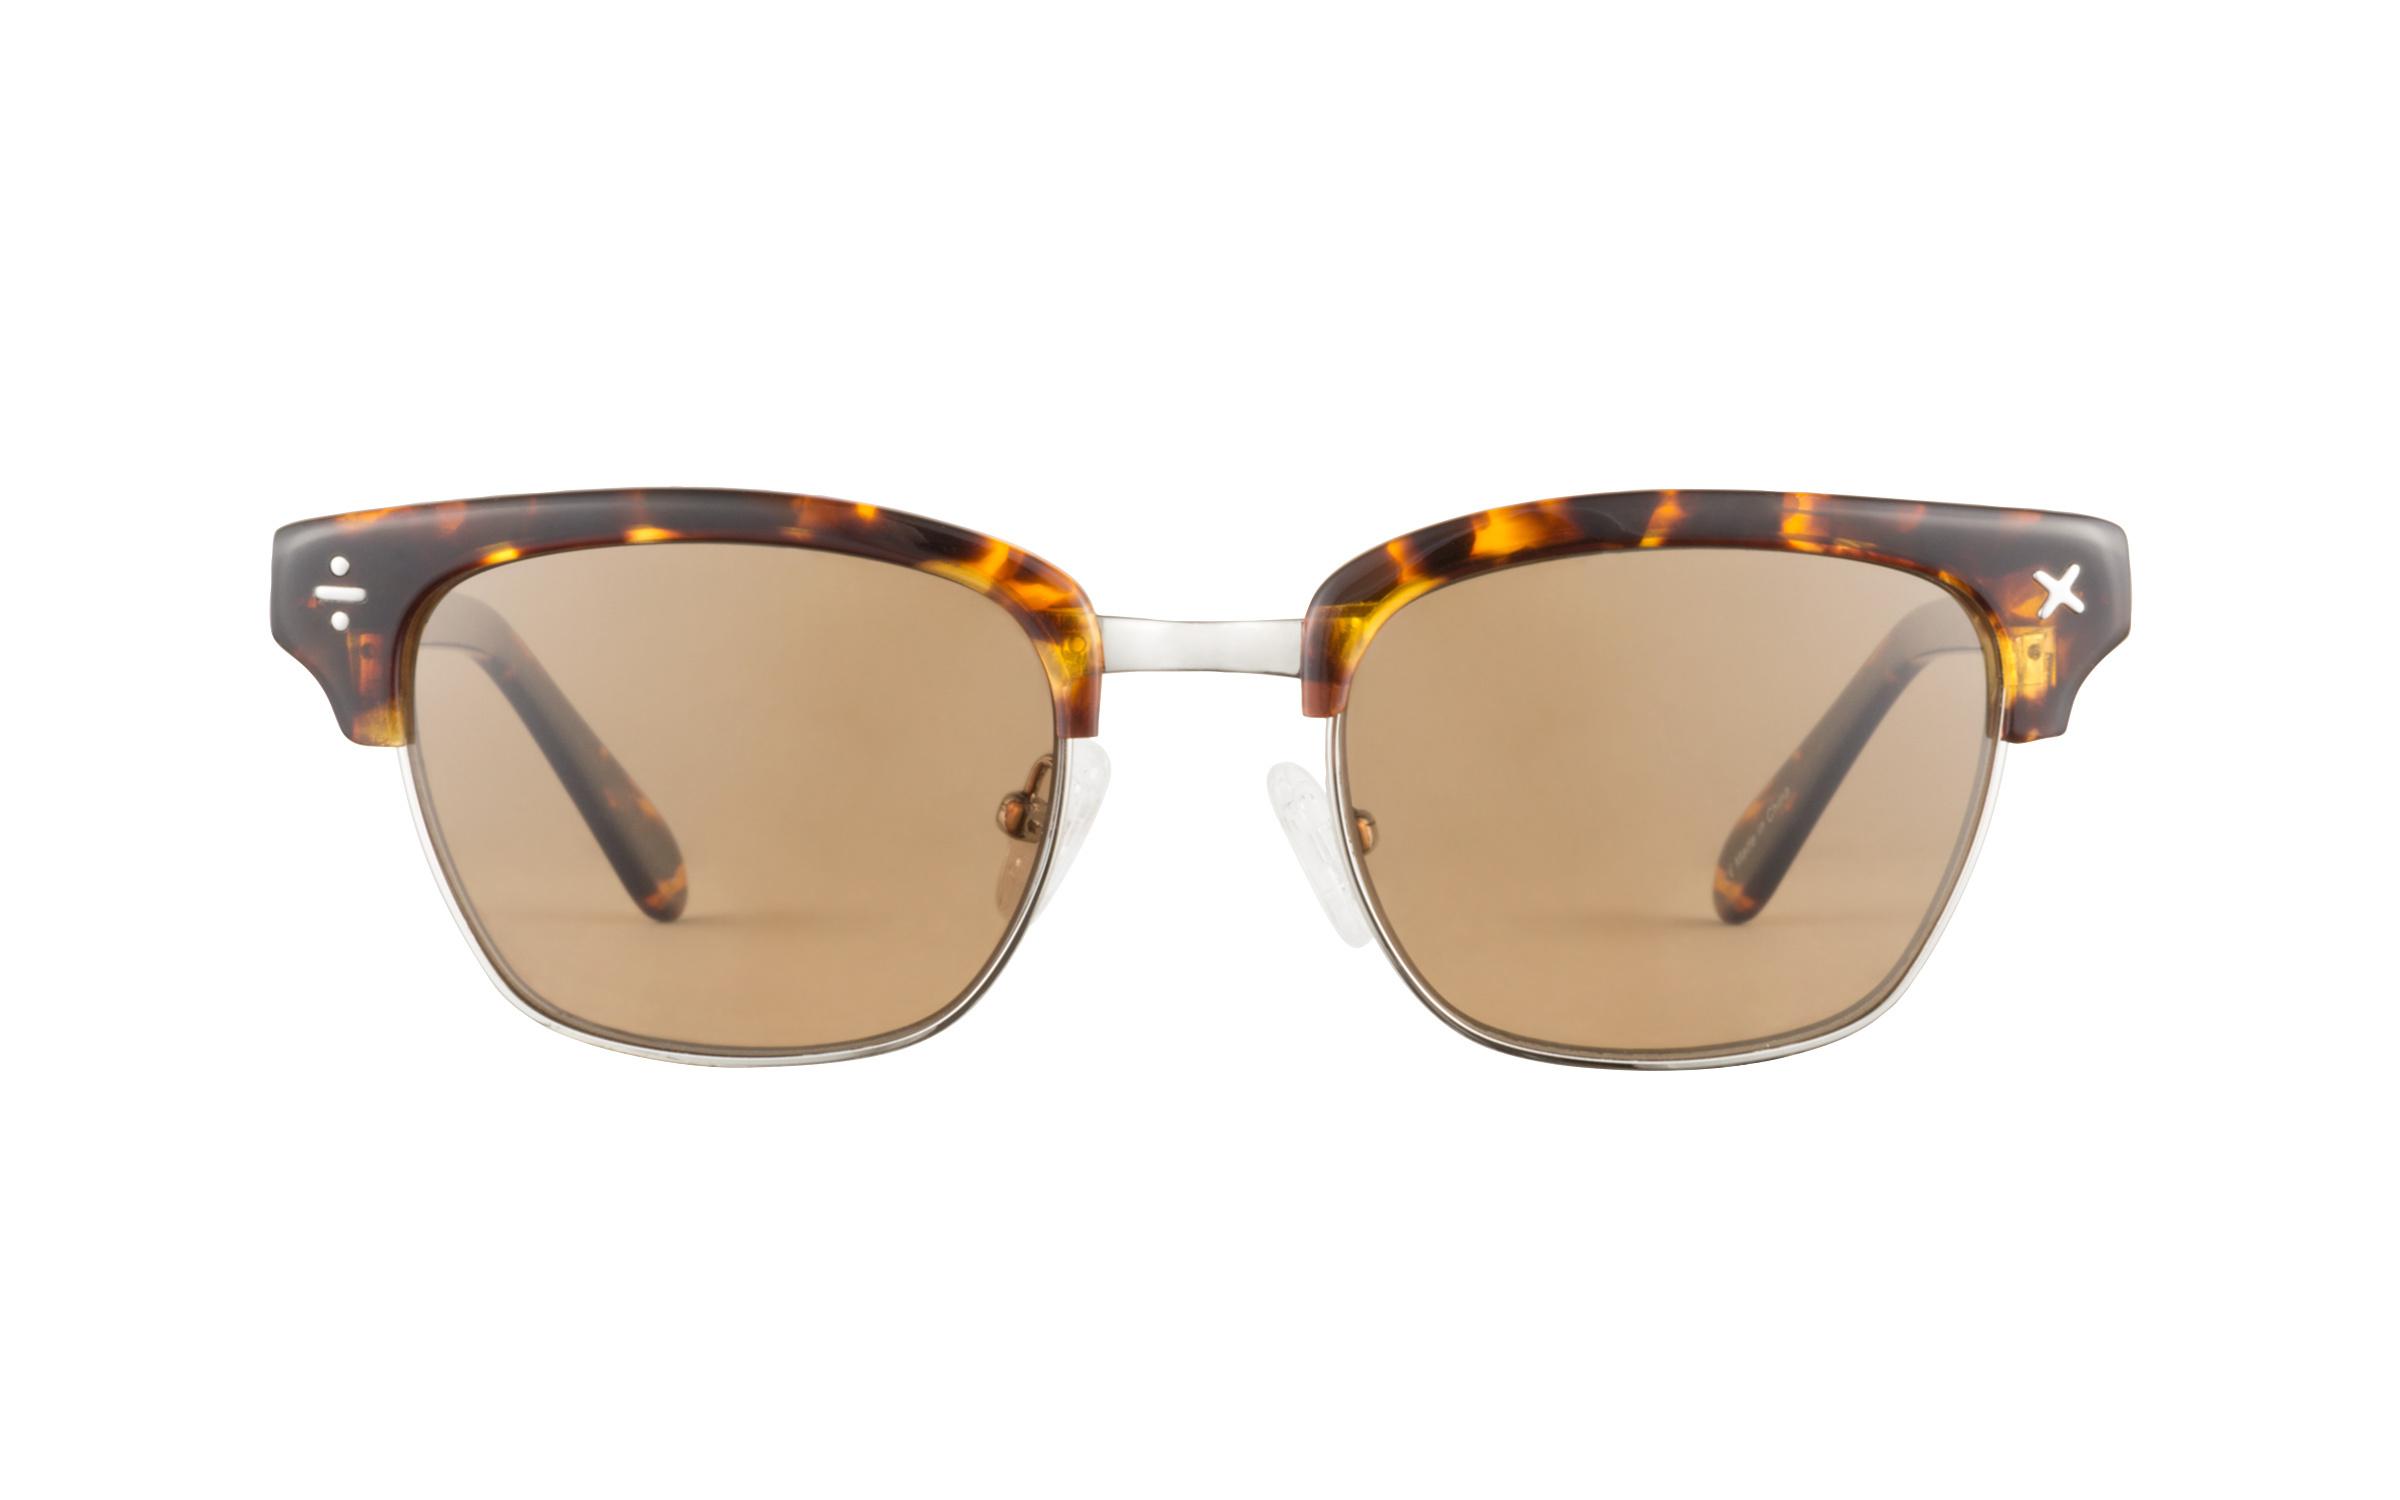 Clubmaster_Sunglasses_Black_Derek_Cardigan_Online_Coastal